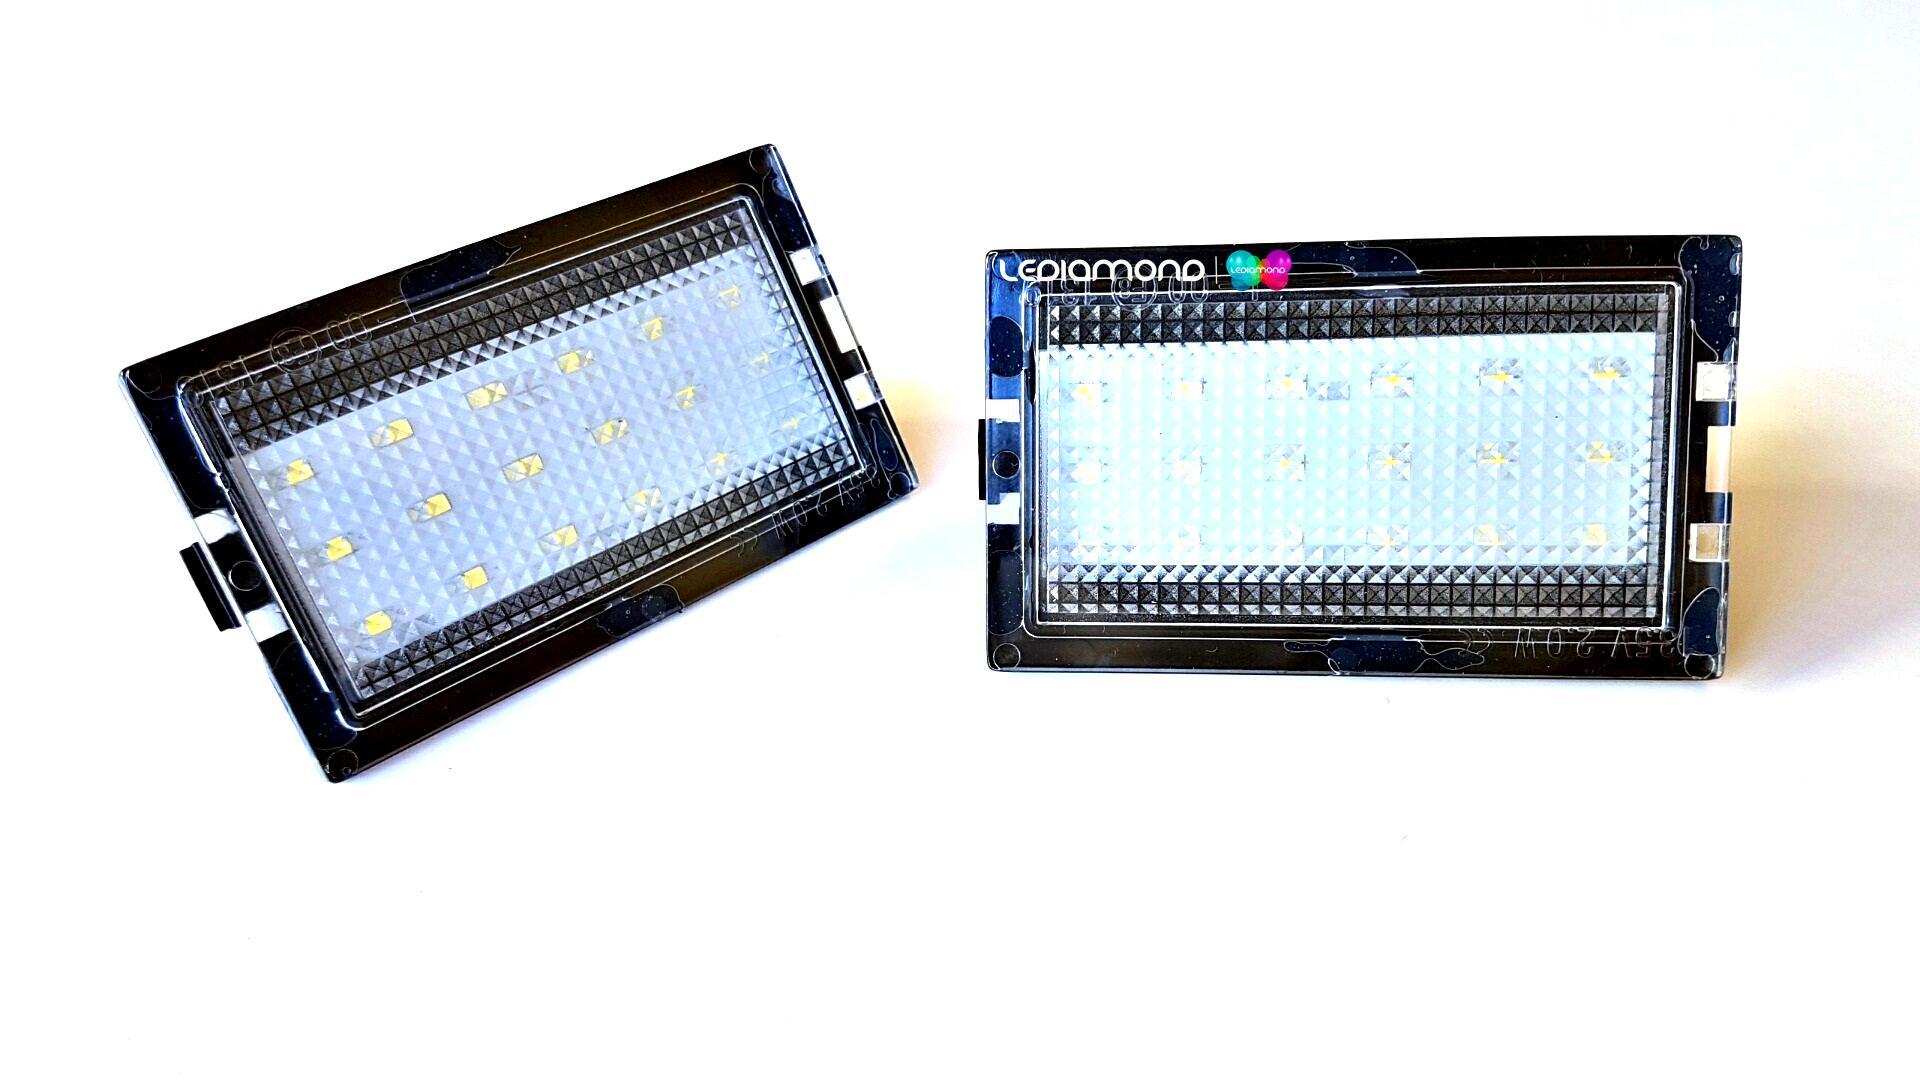 PLAFONES LED LAND ROVER LMD034301 LOGO